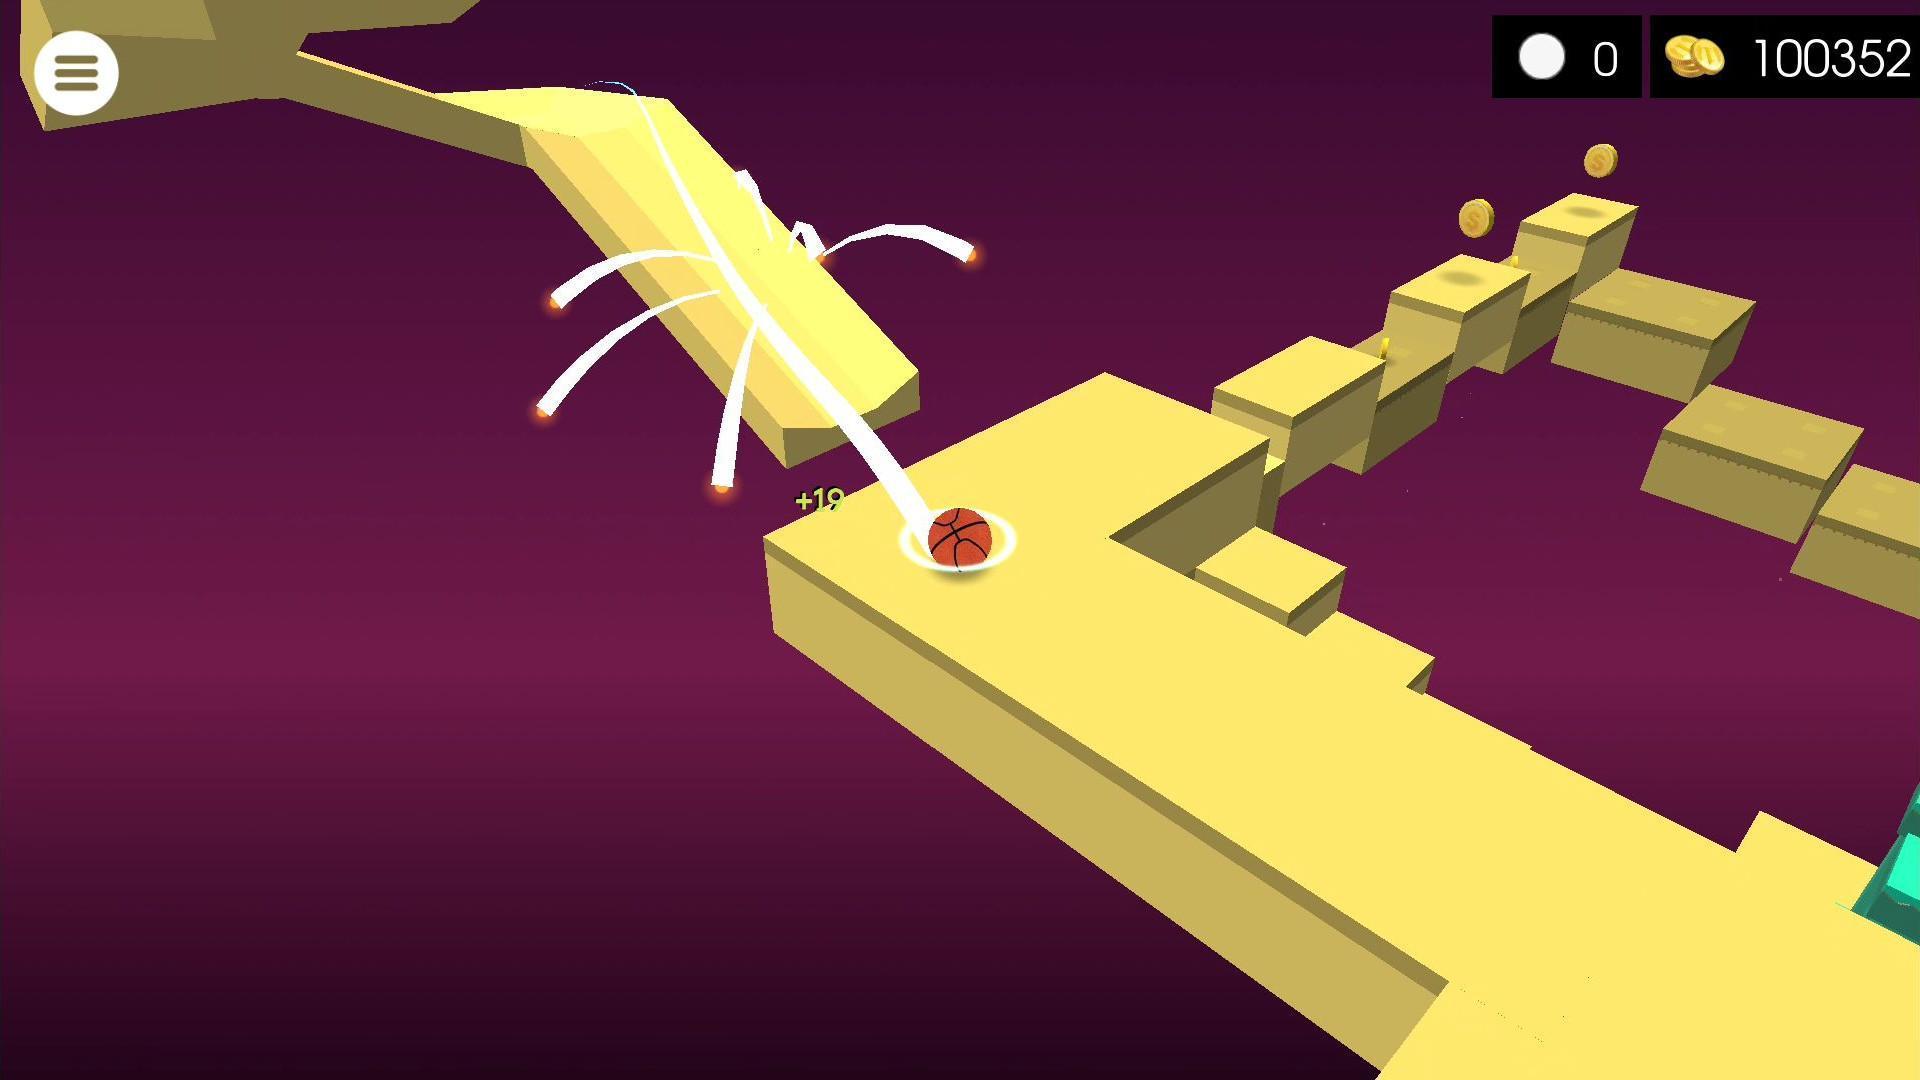 RYWO free 3D roll ball game 1.2.3 Screenshot 4